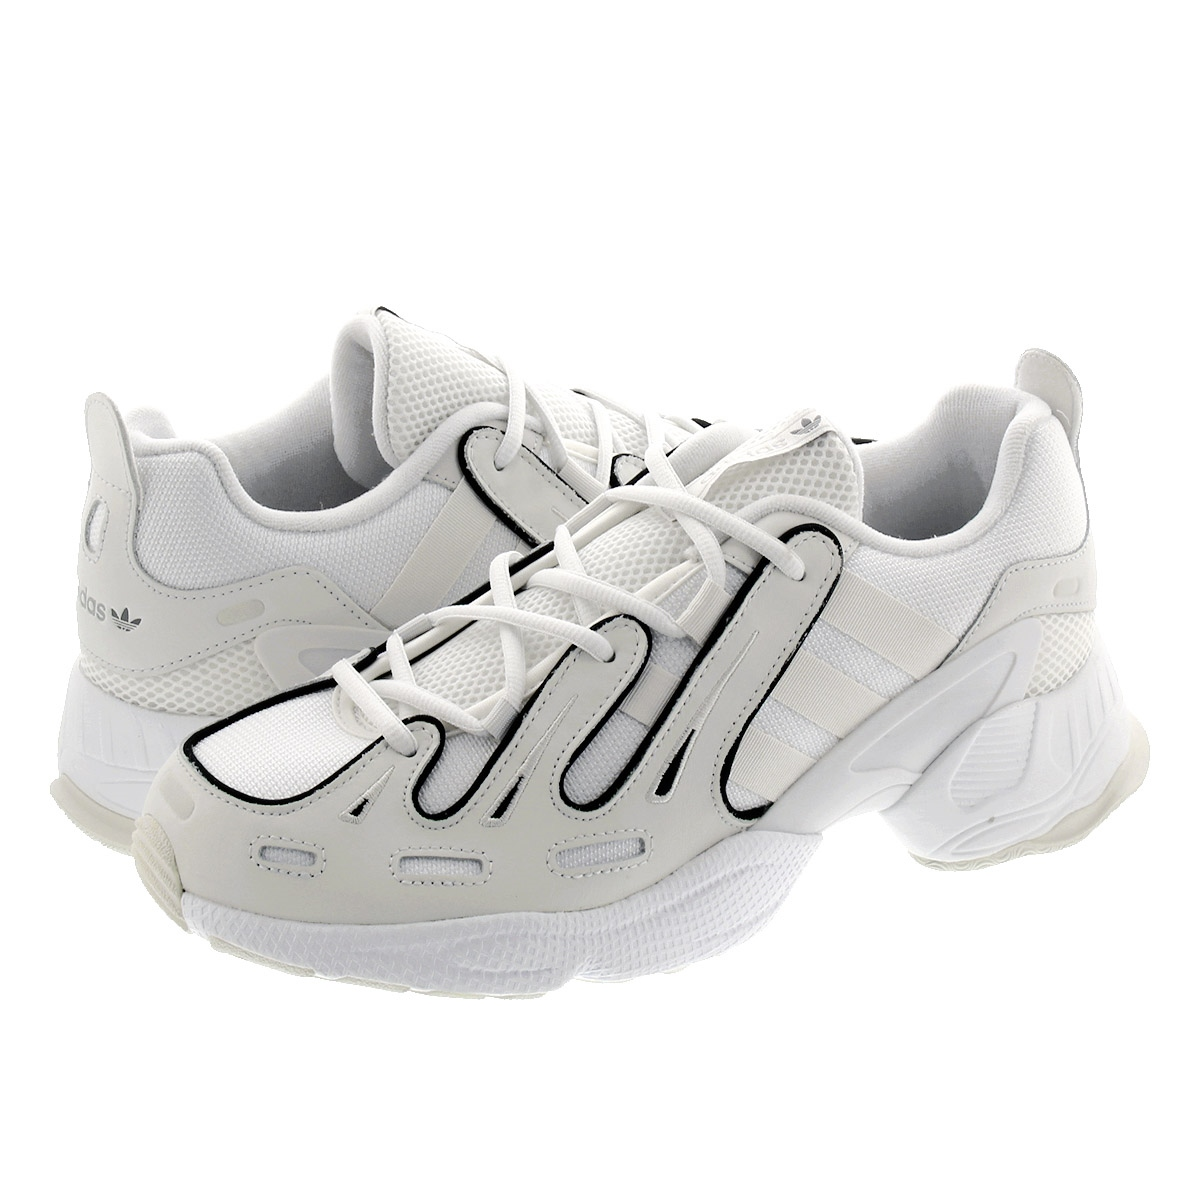 Adidas EQT Gazelle Crystal White & Black | END.